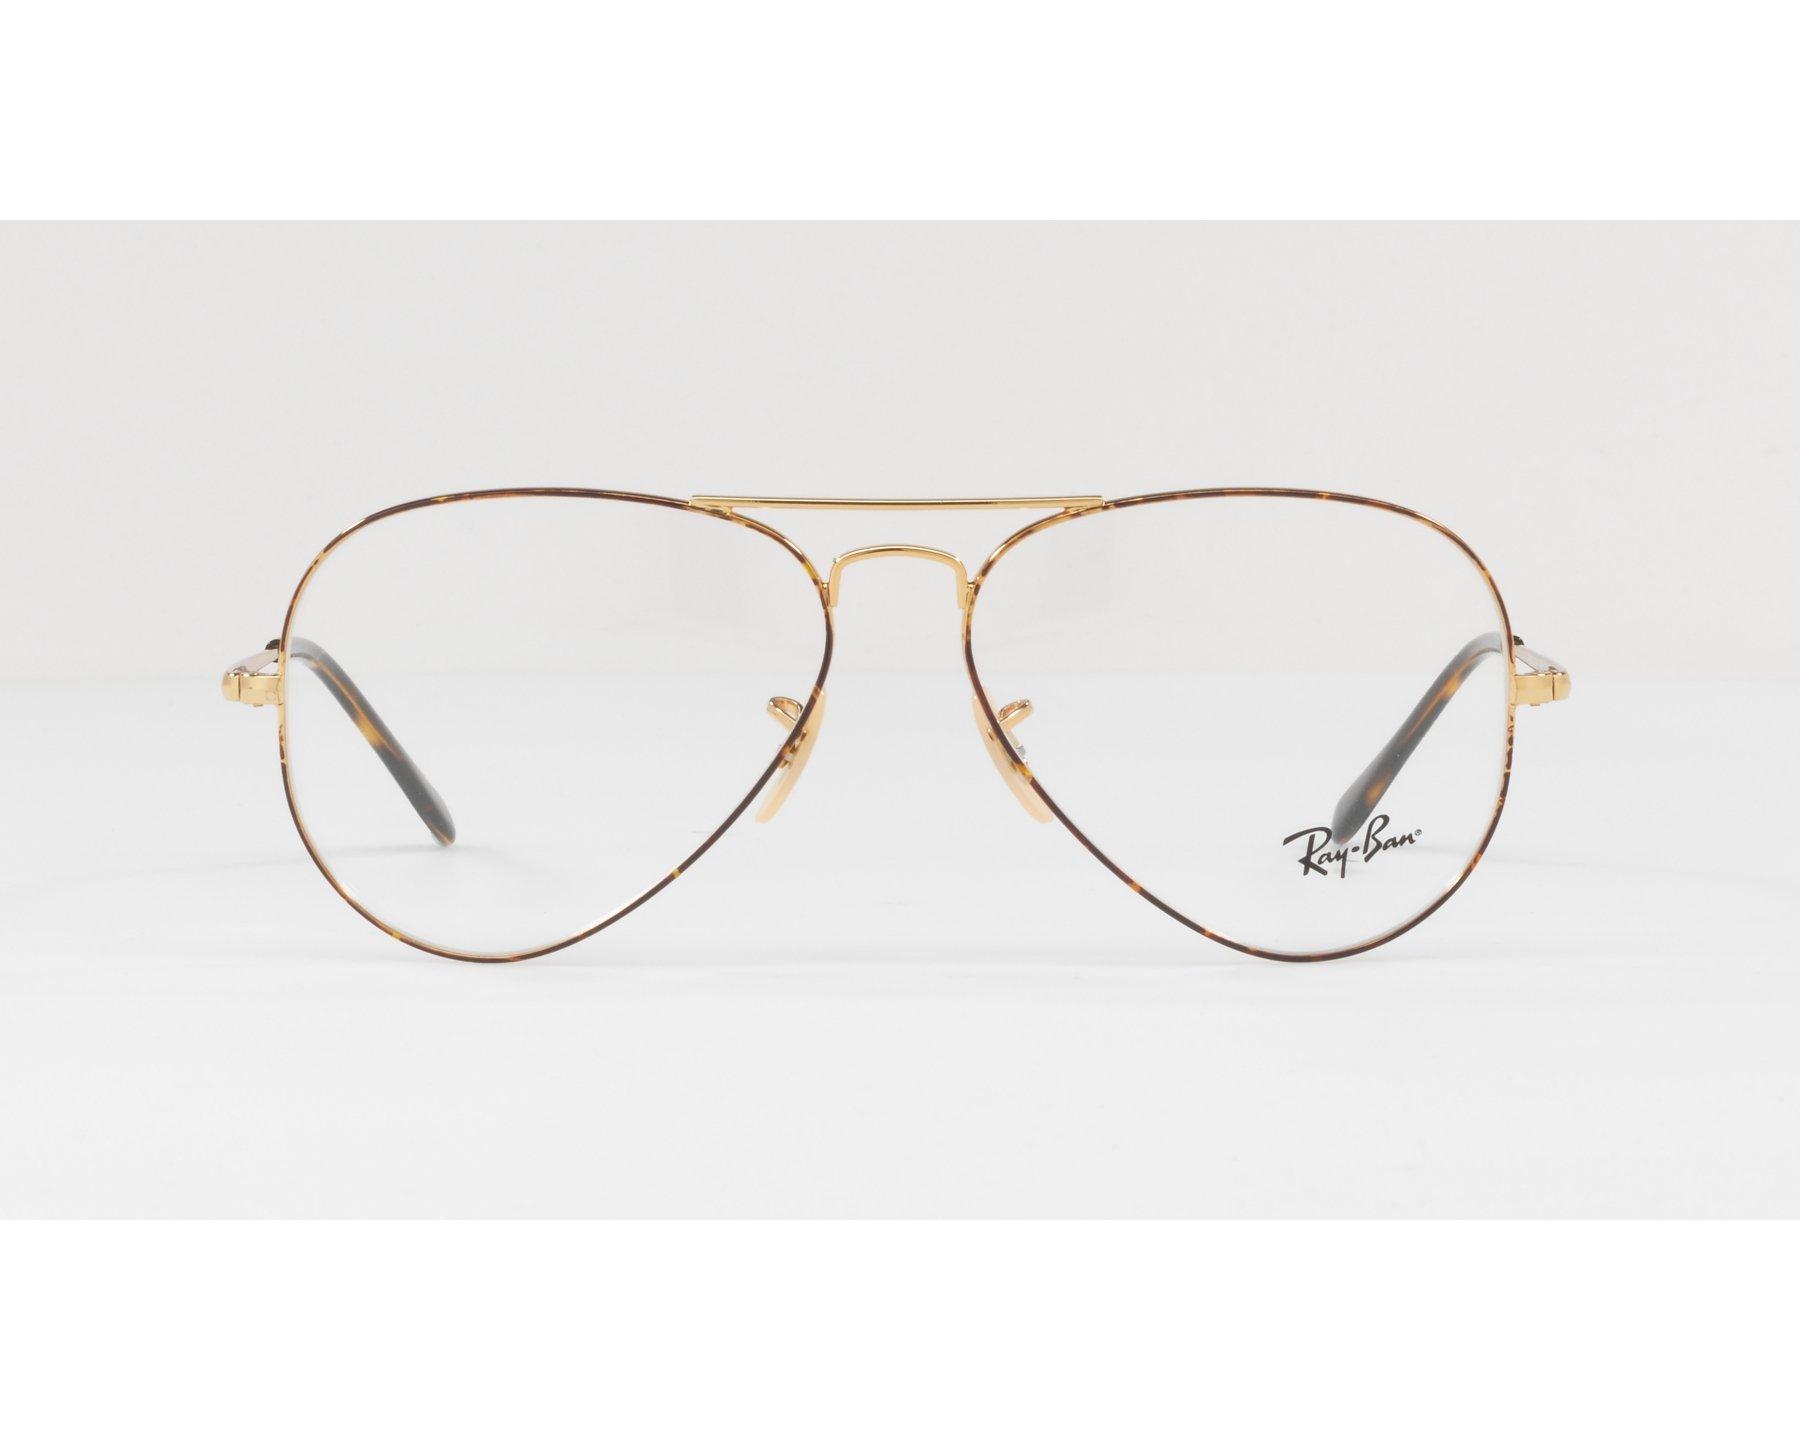 1f2bdbf8a1ff3 eyeglasses Ray-Ban RX-6489 2945 55-14 Havana Gold 360 degree view